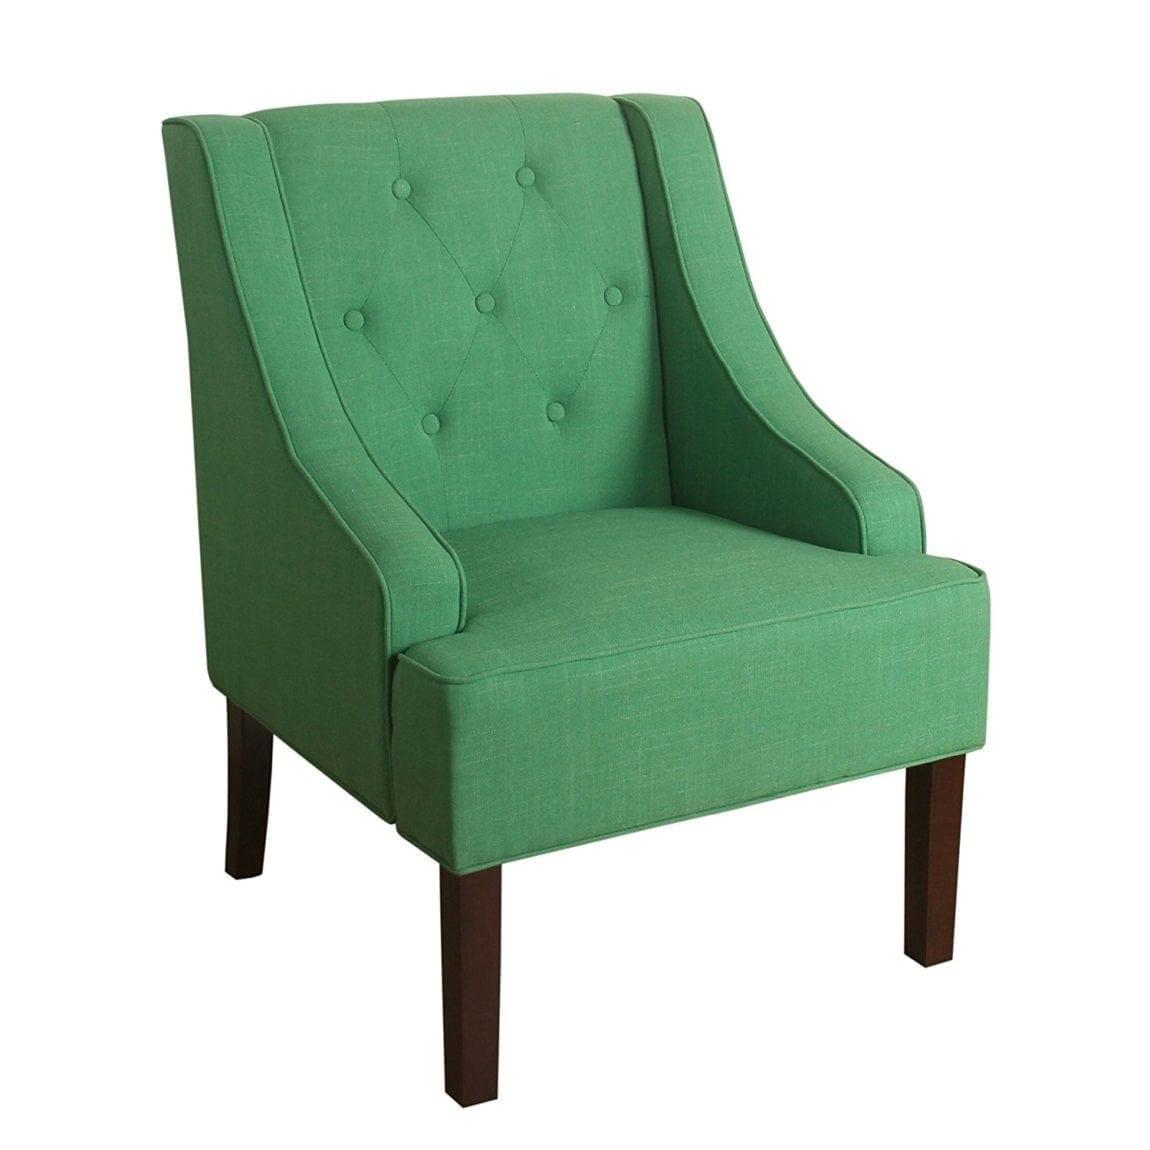 9. Mid Century Modern Style Chair